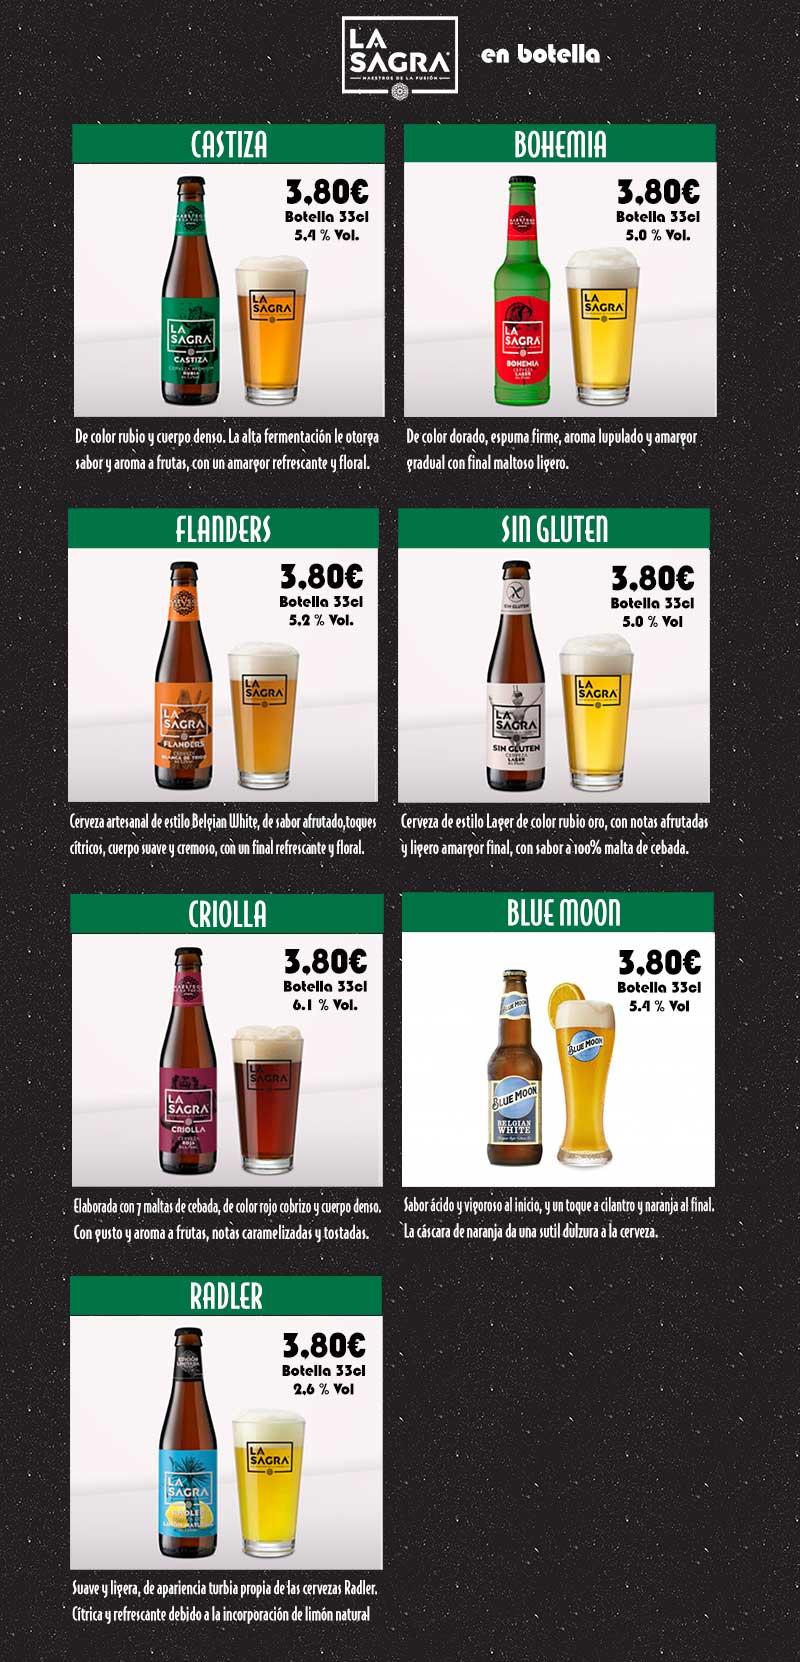 "Cerveza en botella ""La Sagra"""